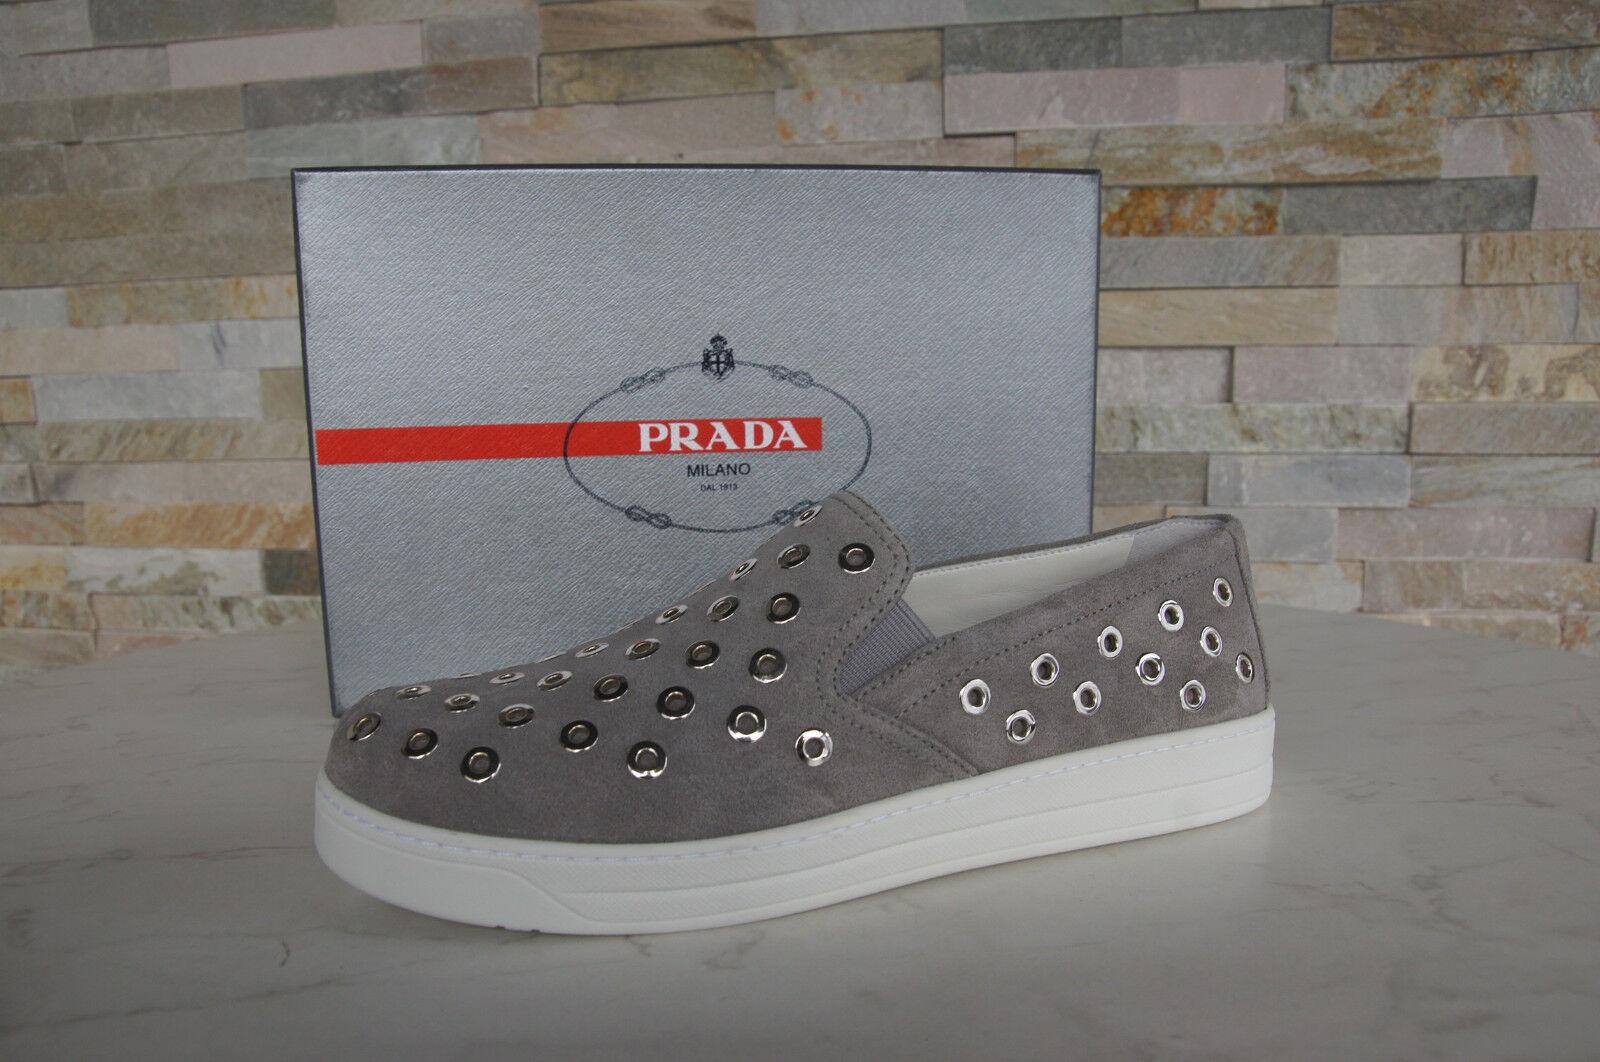 PRADA Gr 39 Slipper Sneakers Slip On Schuhe Suede 3S6159 grau NEU ehem